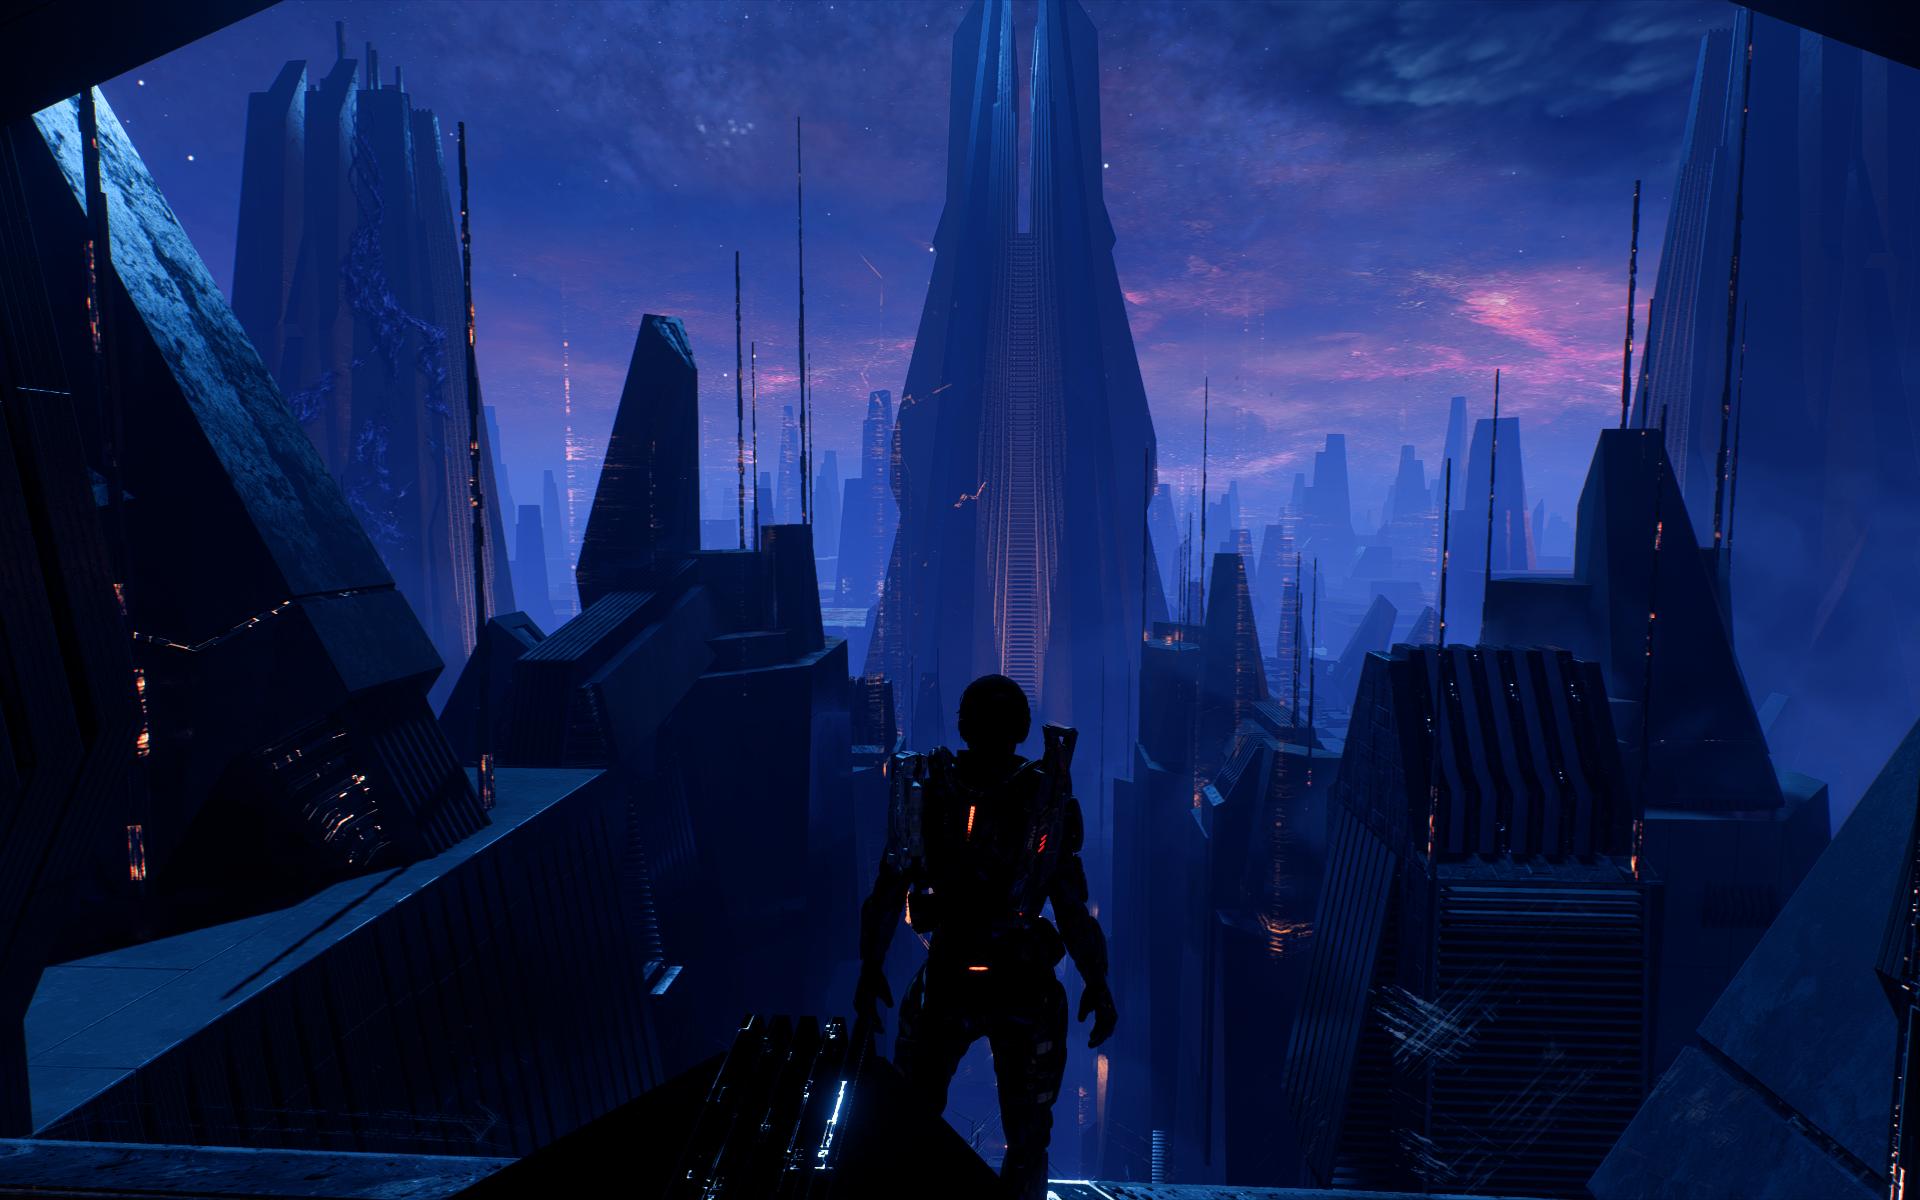 Mass Effect Andromeda Screenshot  - 01.01.36.61.png - Mass Effect: Andromeda